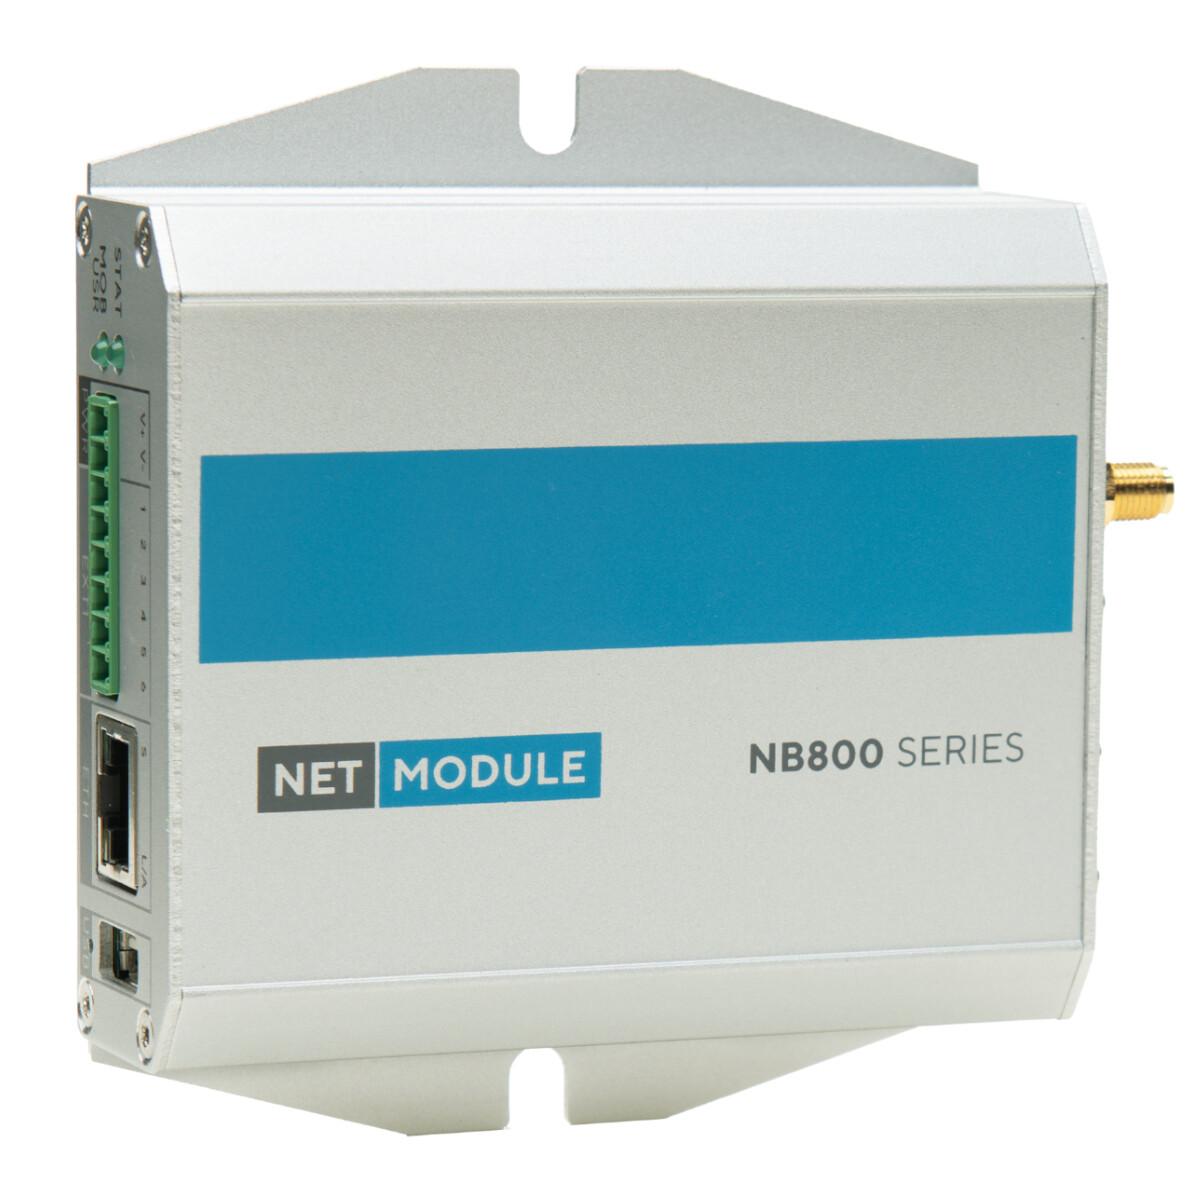 NB800-LbbWWtSu-G